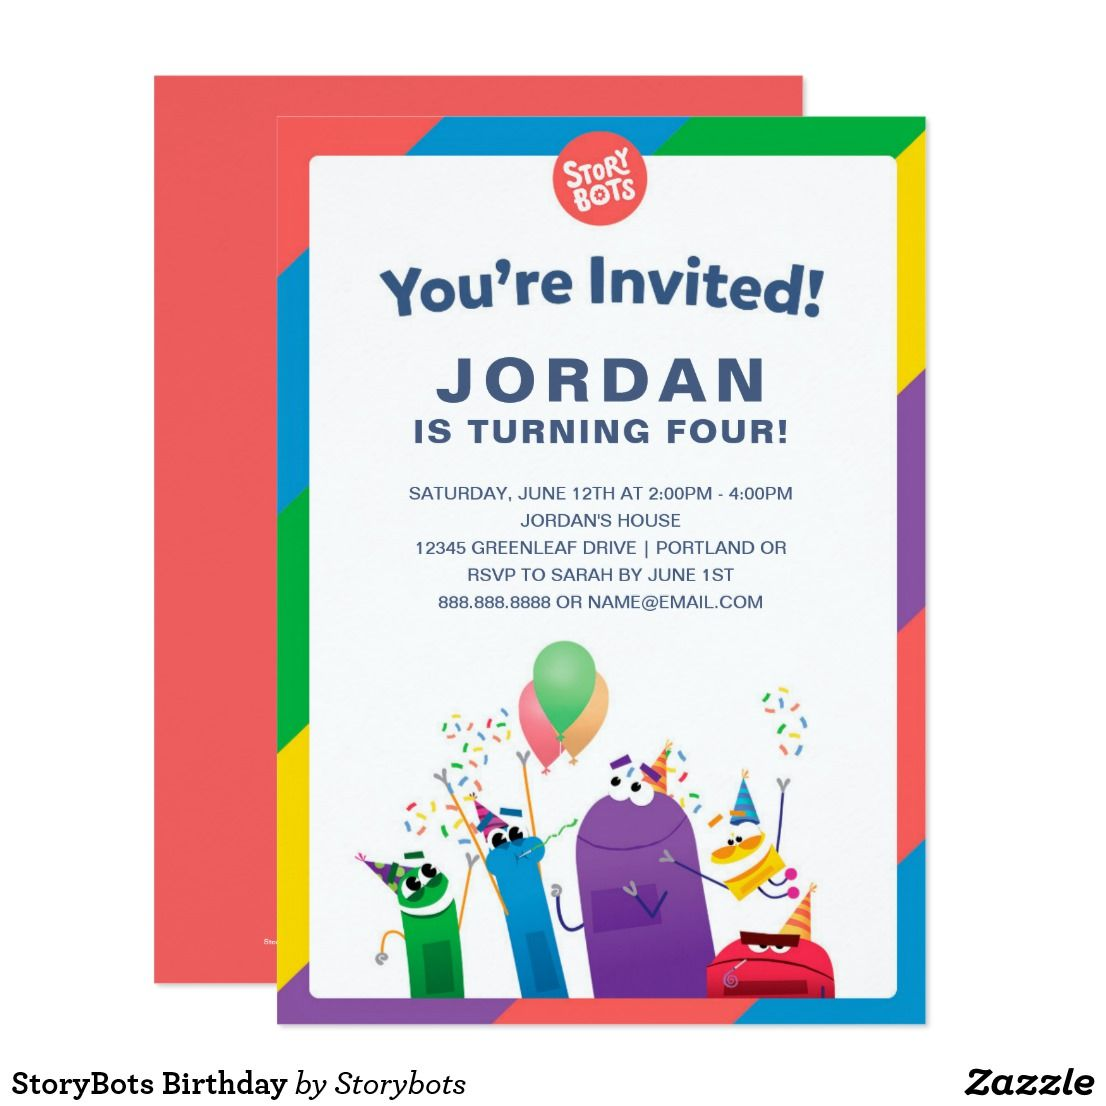 StoryBots Birthday Card Personalized invitations